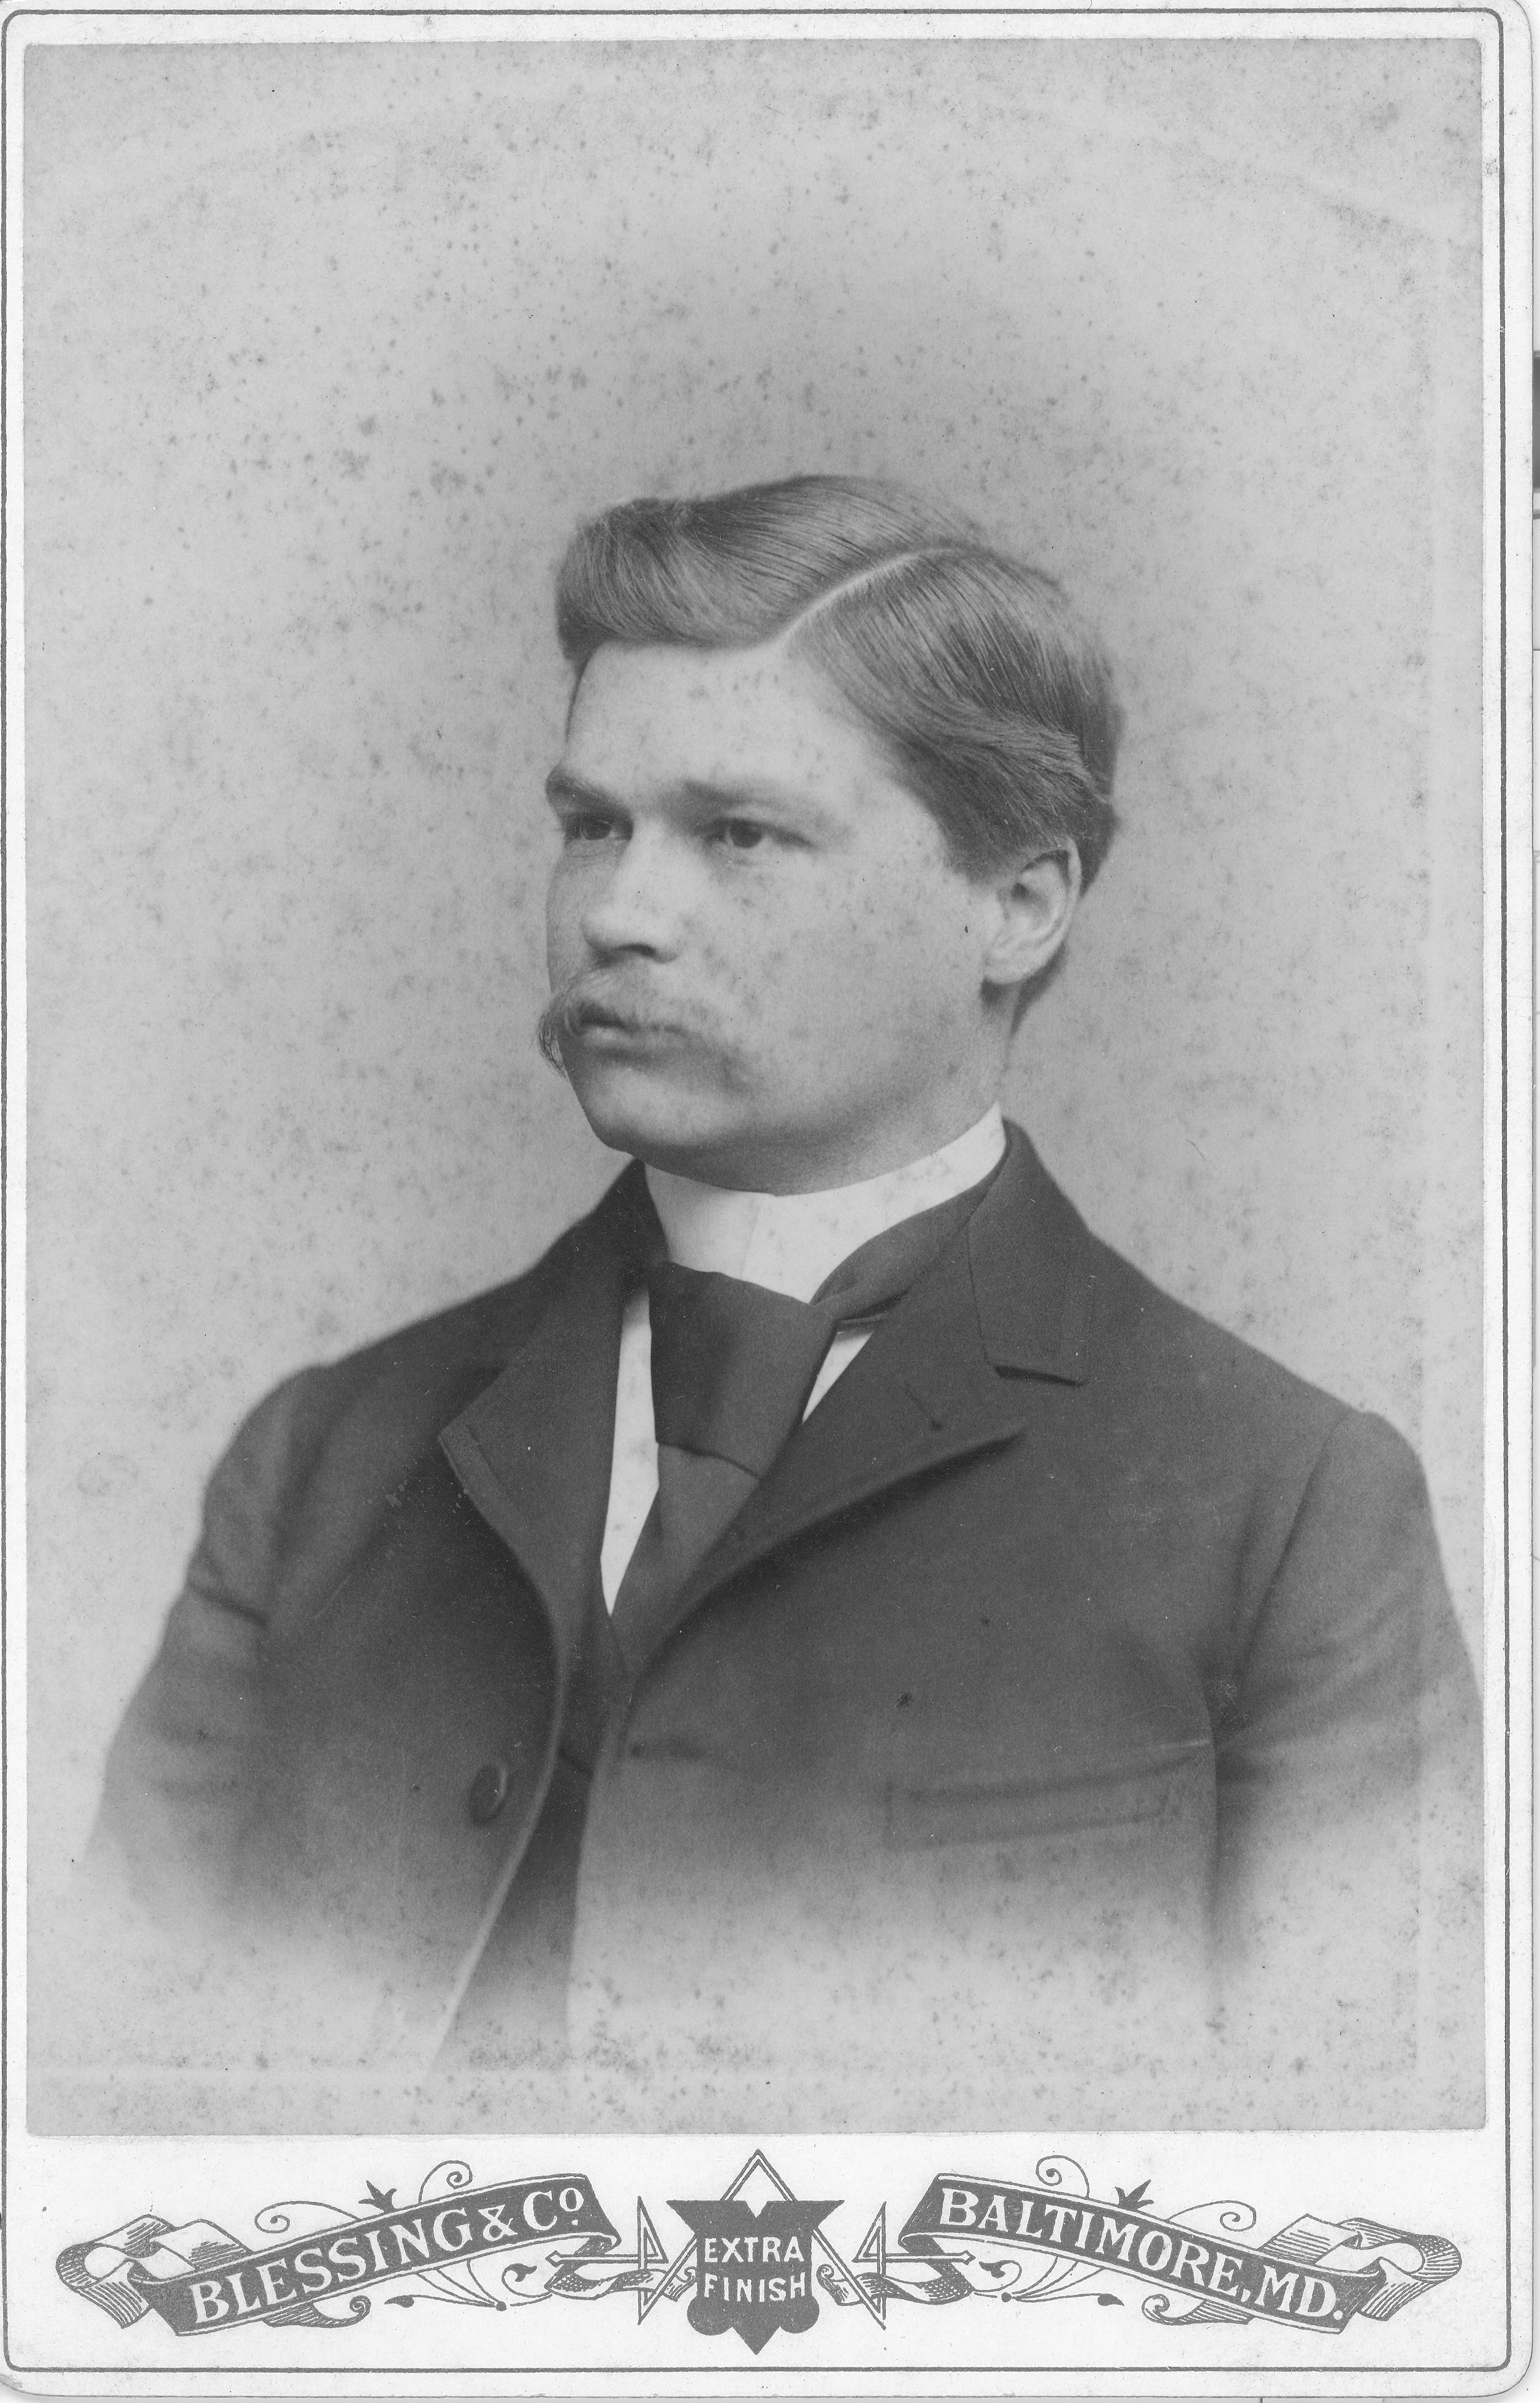 Joseph Calhoun Joe Arrington